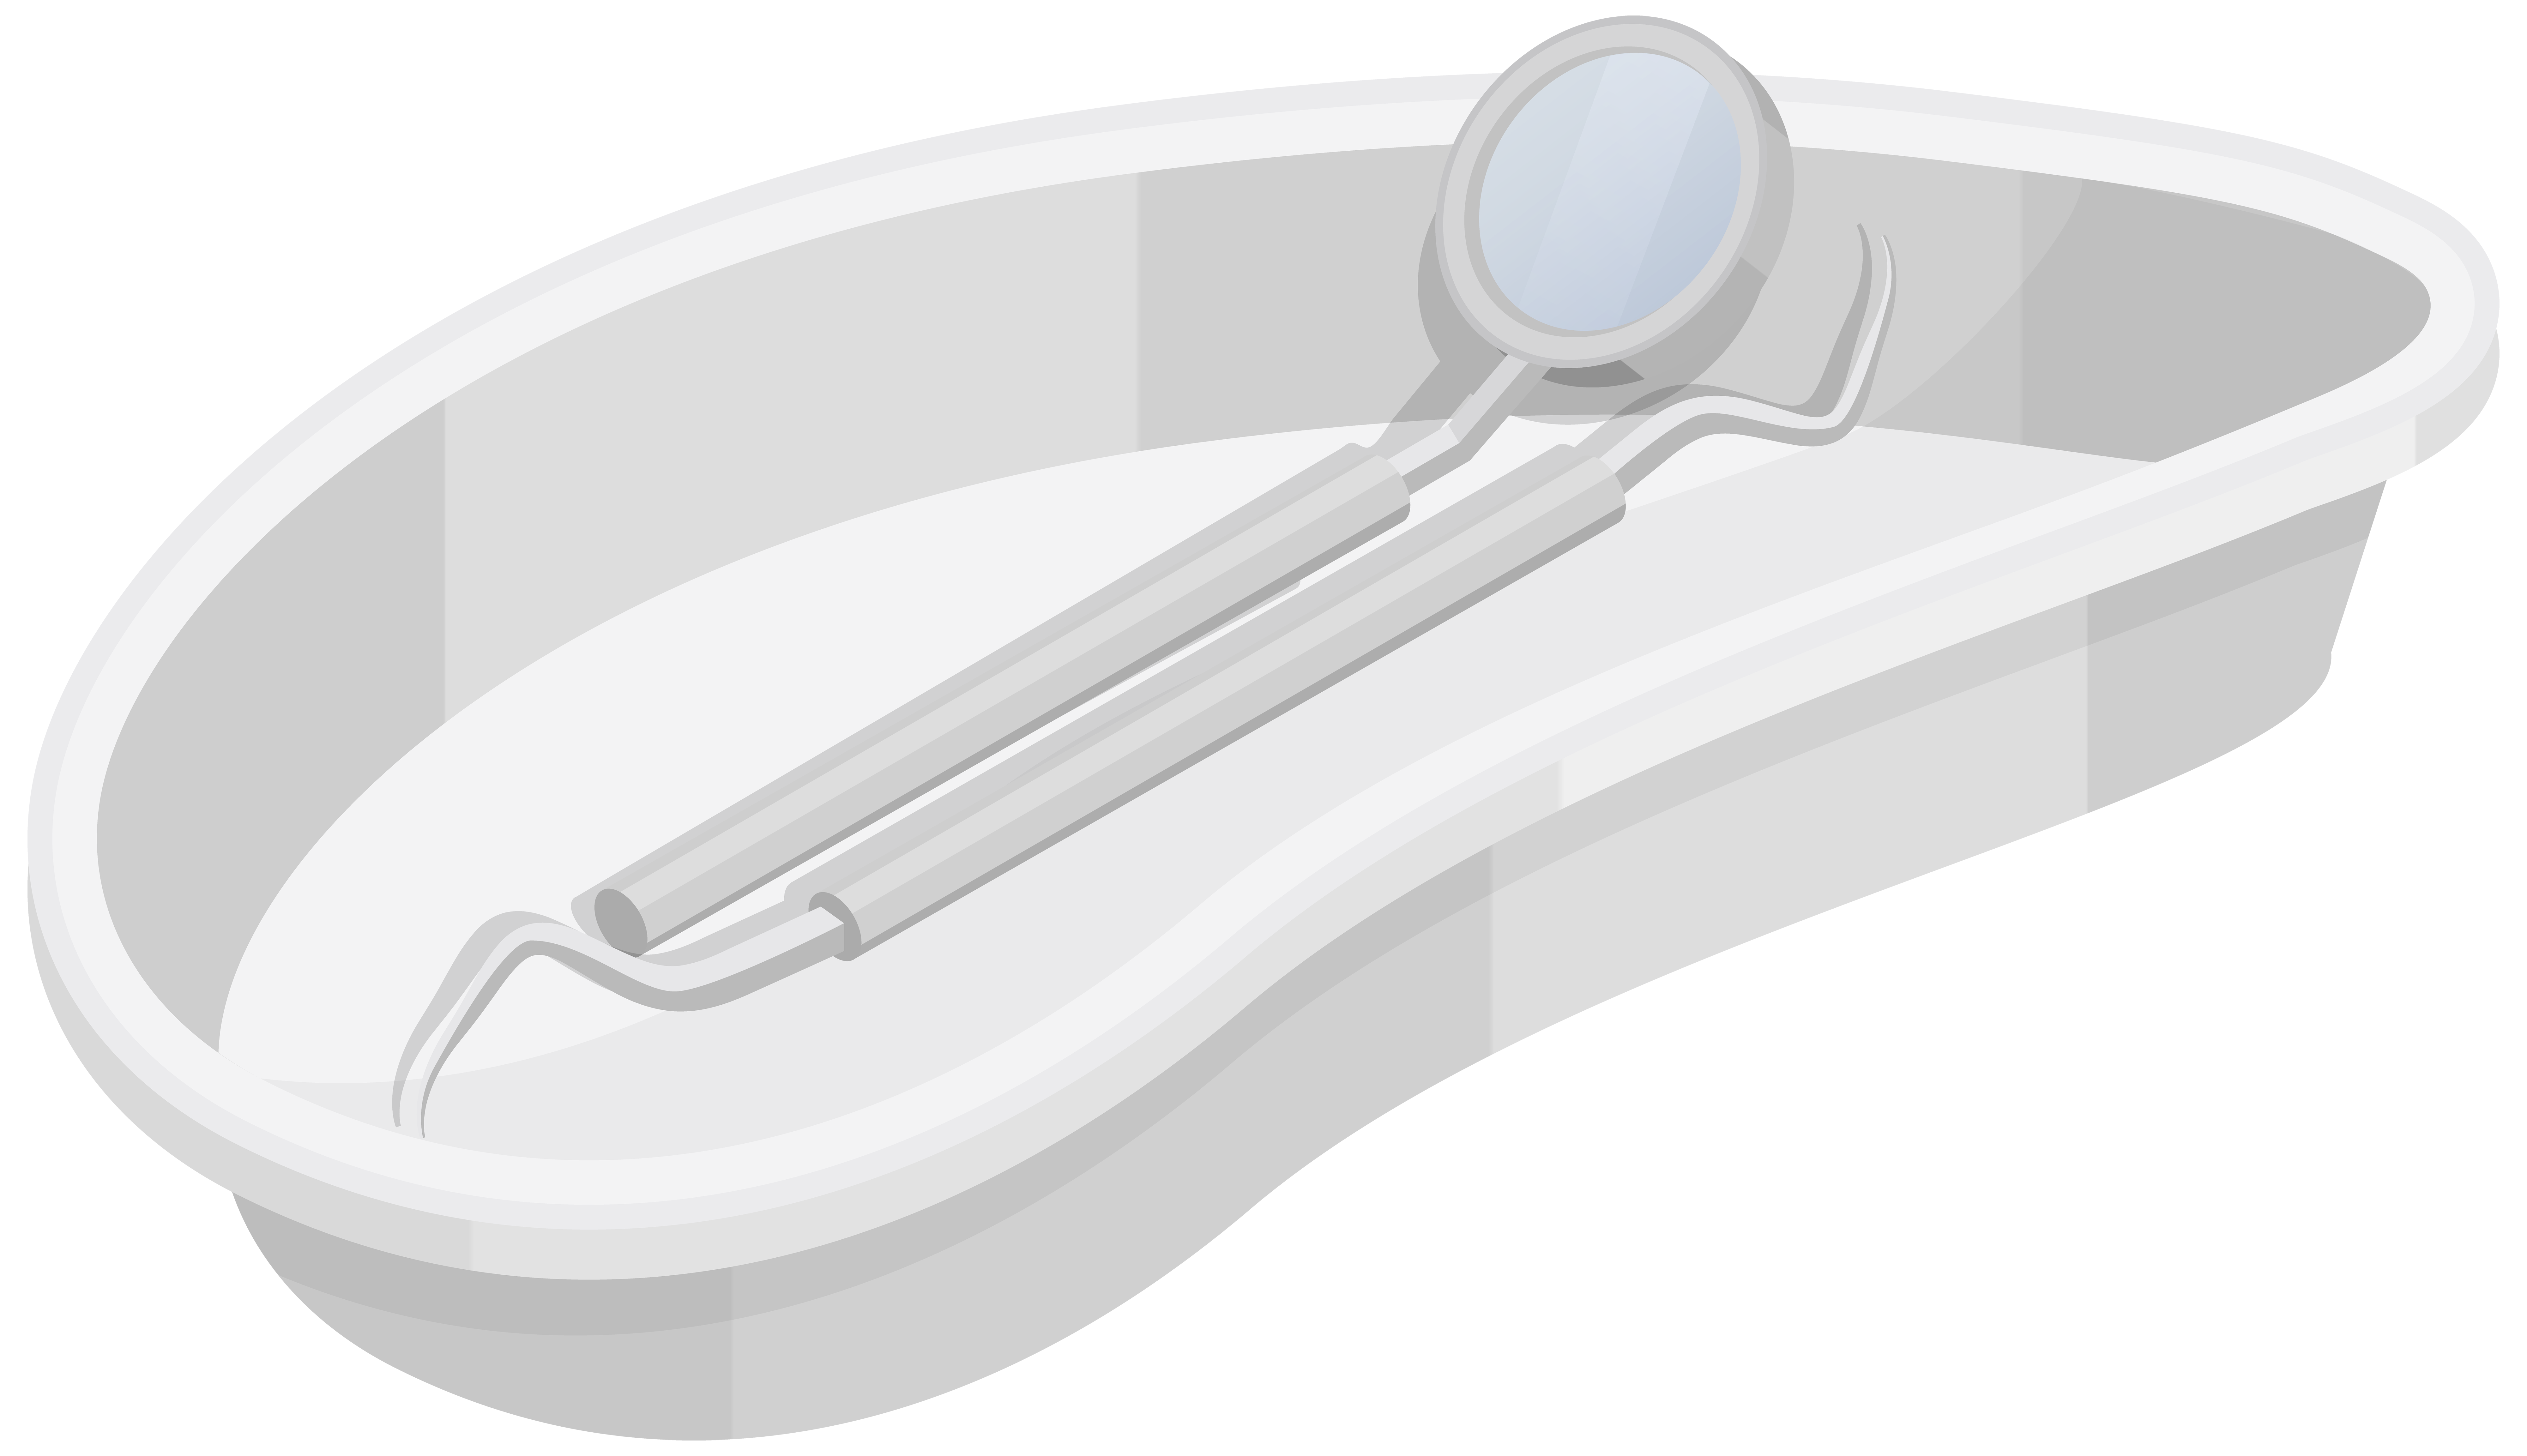 Dentist Tools Clipart | Free download best Dentist Tools